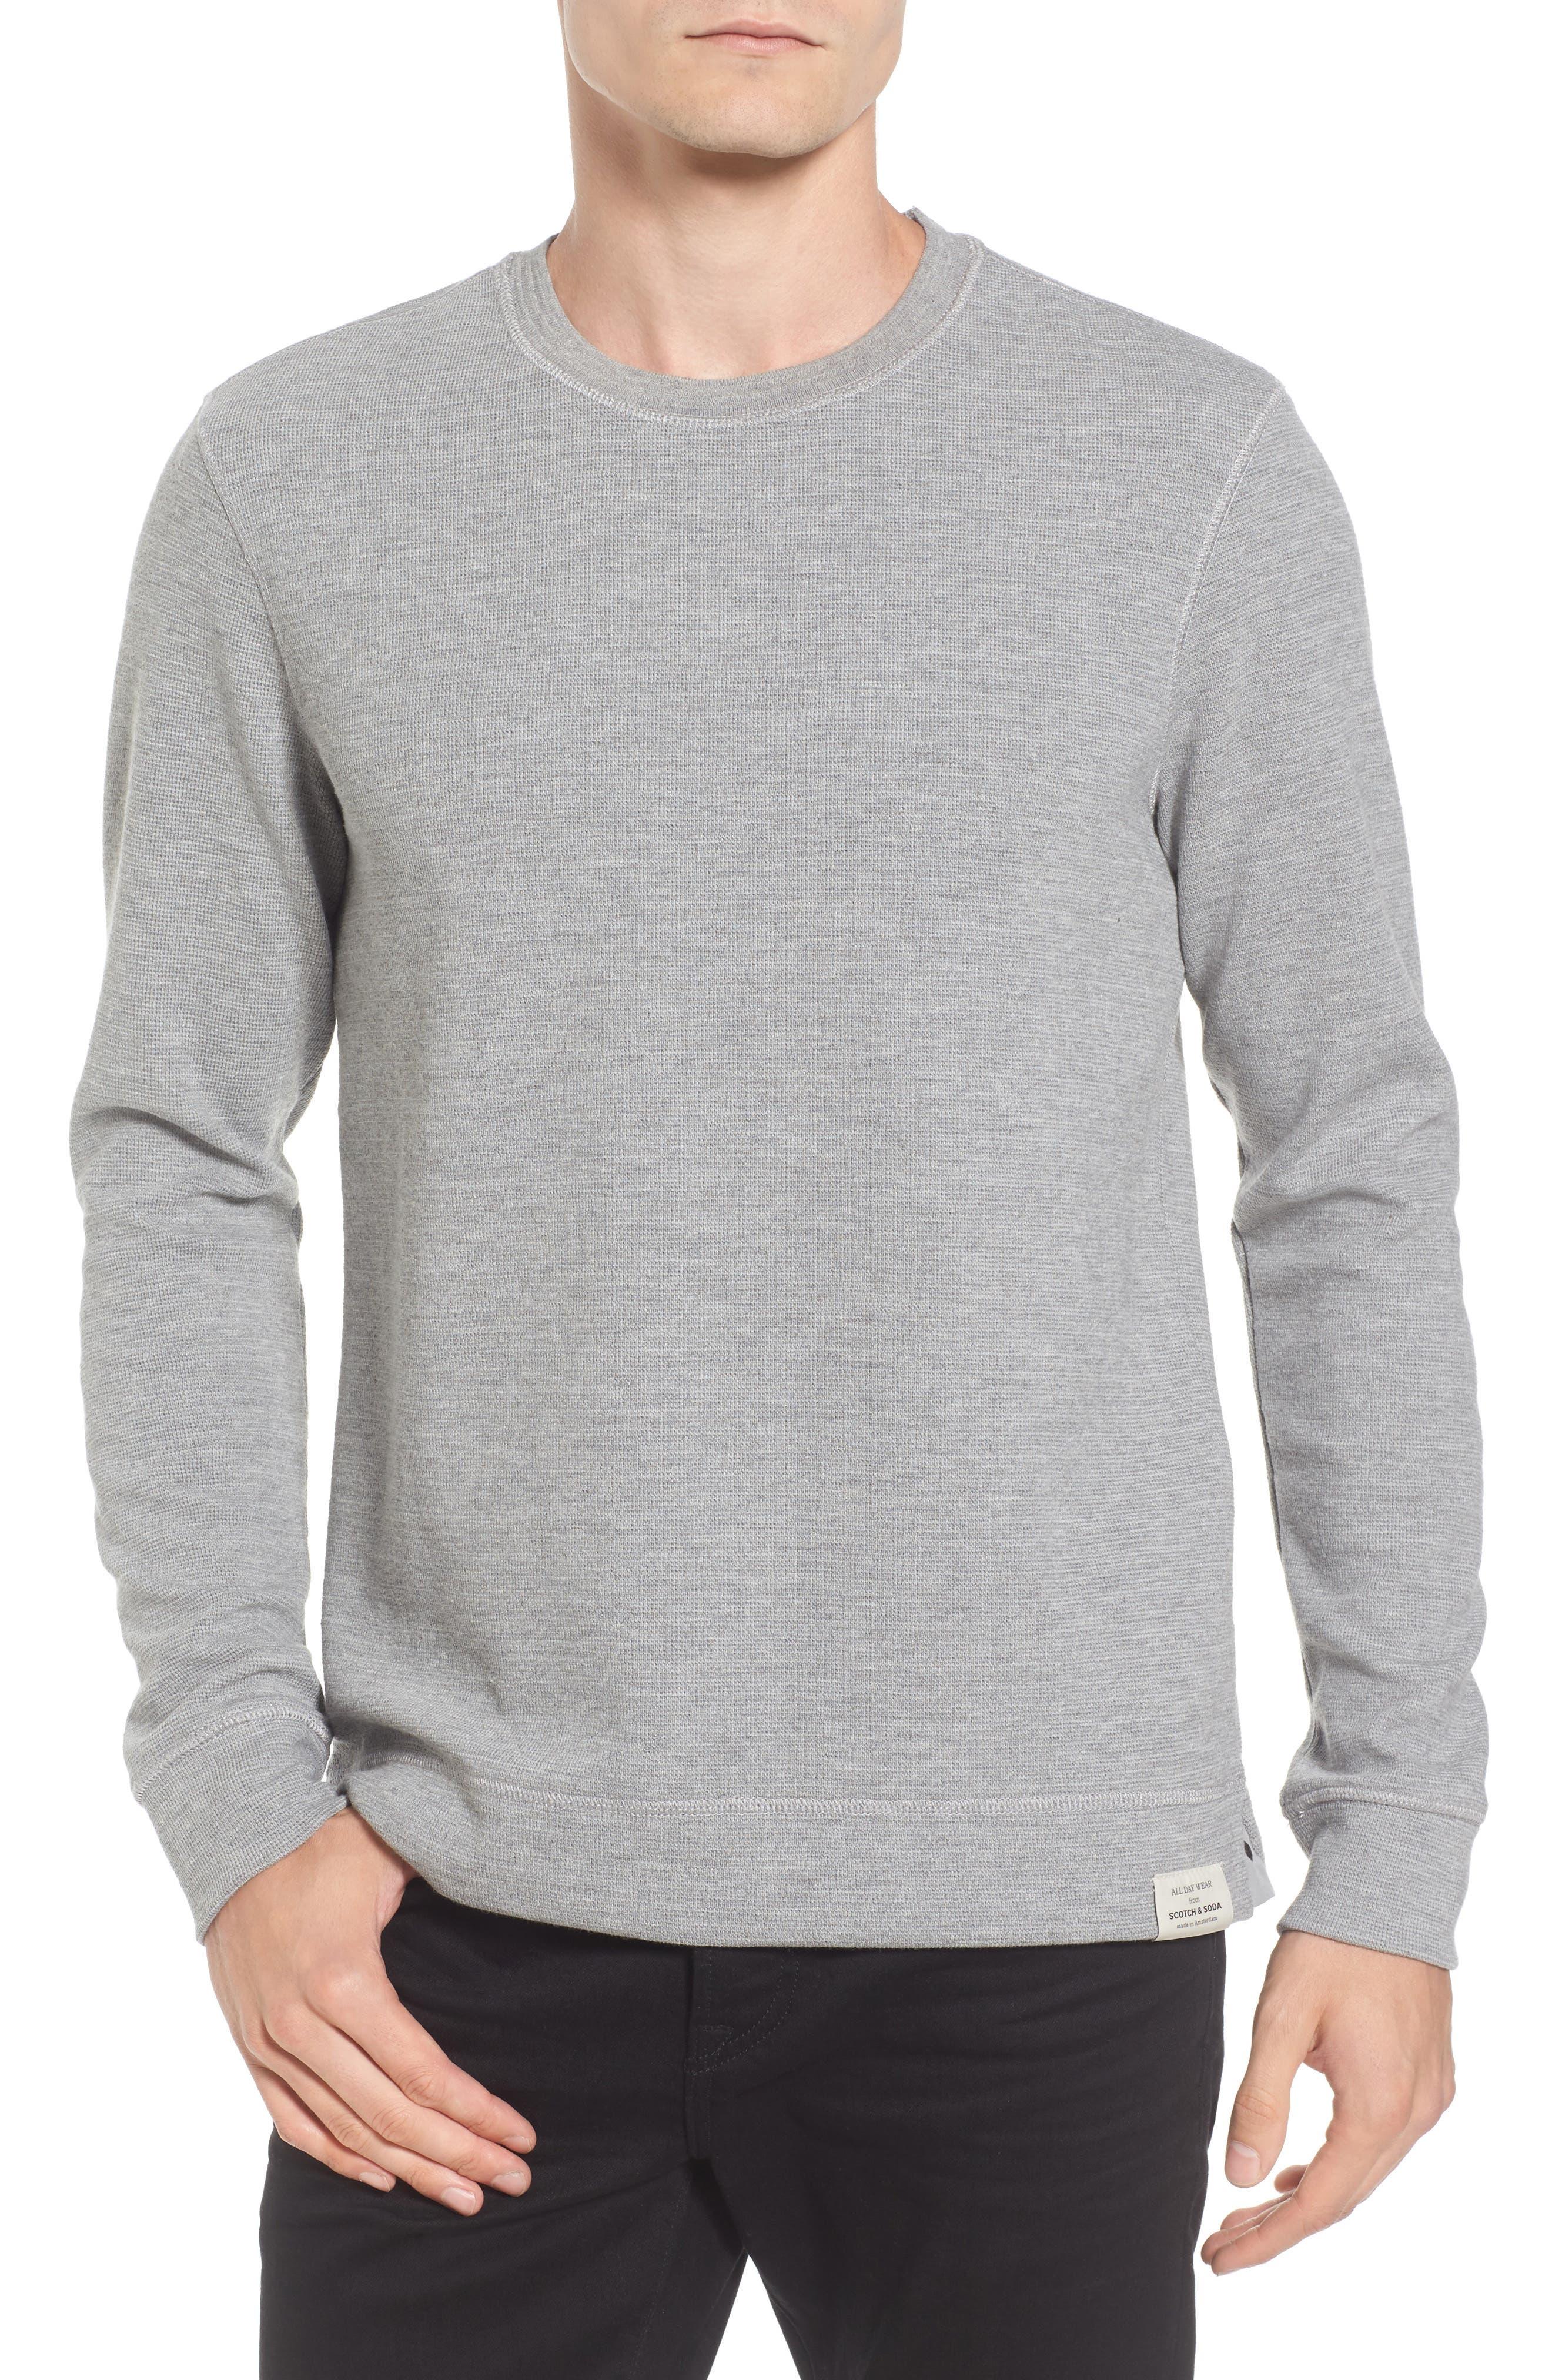 Main Image - Scotch & Soda Classic Sweatshirt